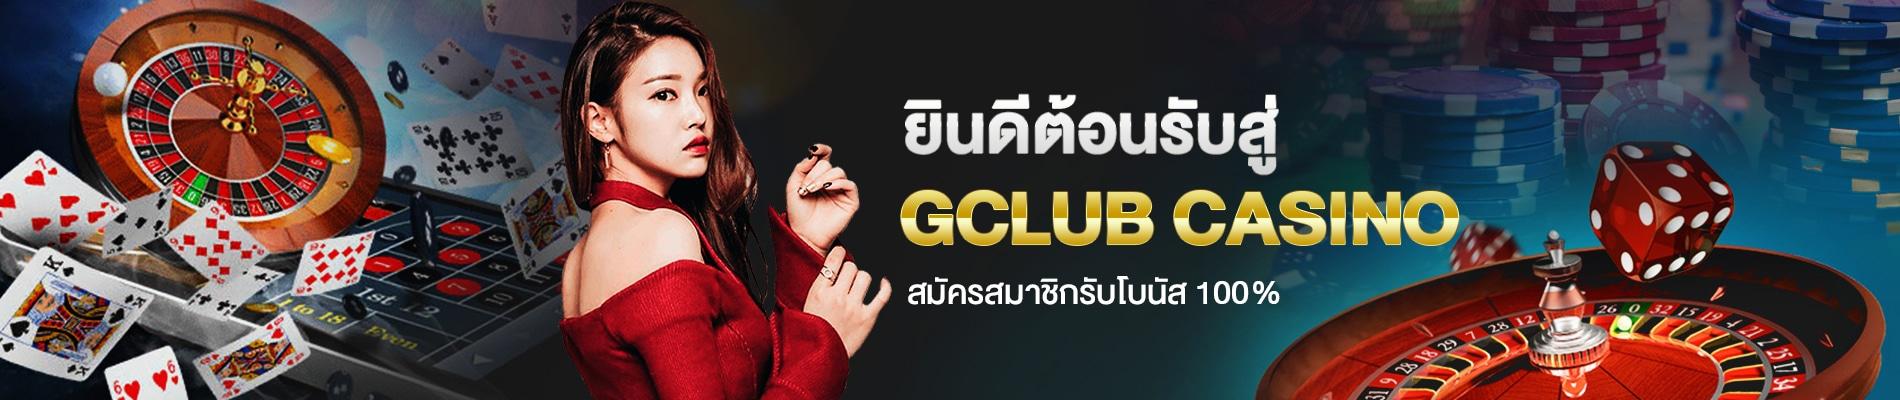 Gclub-เข้าสู่ระบบ5-BIGWIN369